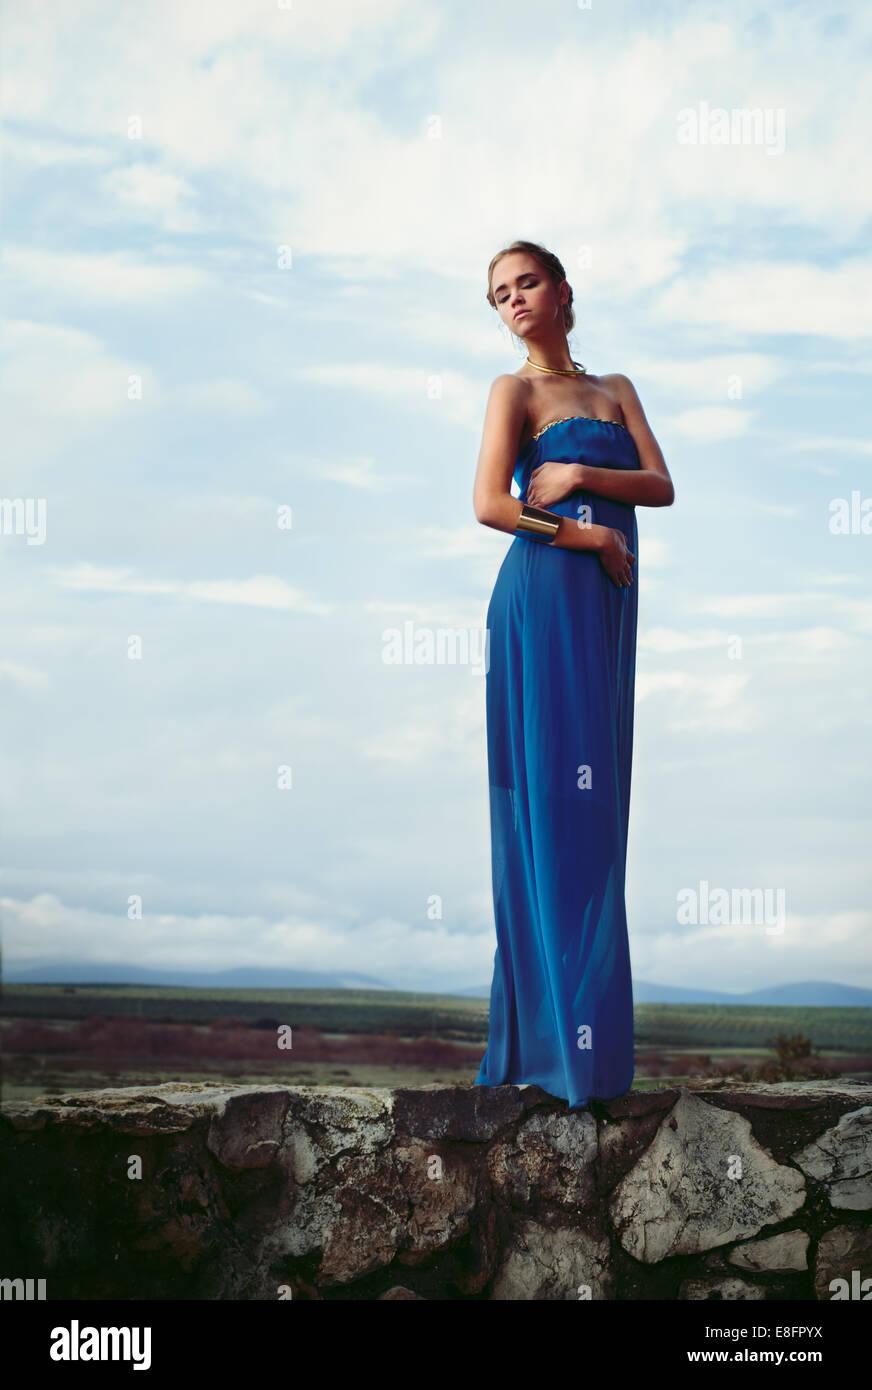 info for 1e7f7 e2413 Frau trägt blaue langes Kleid stehend auf Steinmauer ...